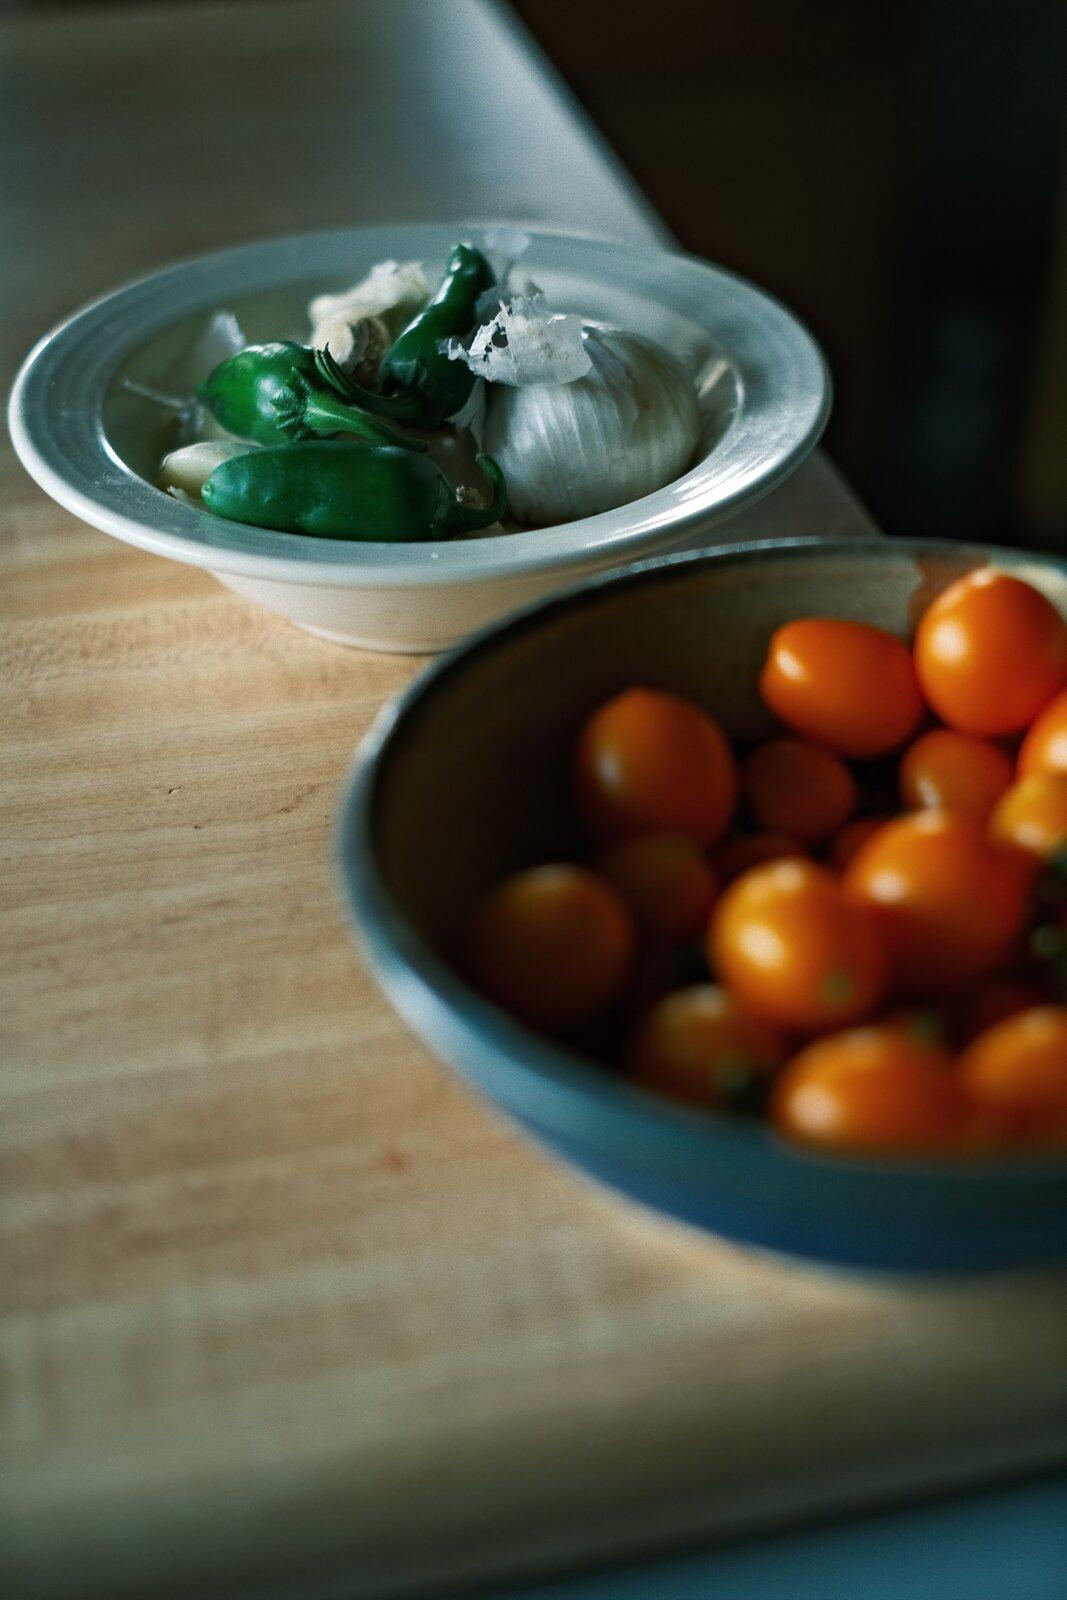 XPro3_Aug28_21_garden_tomatoes_&_jalapenos.jpg